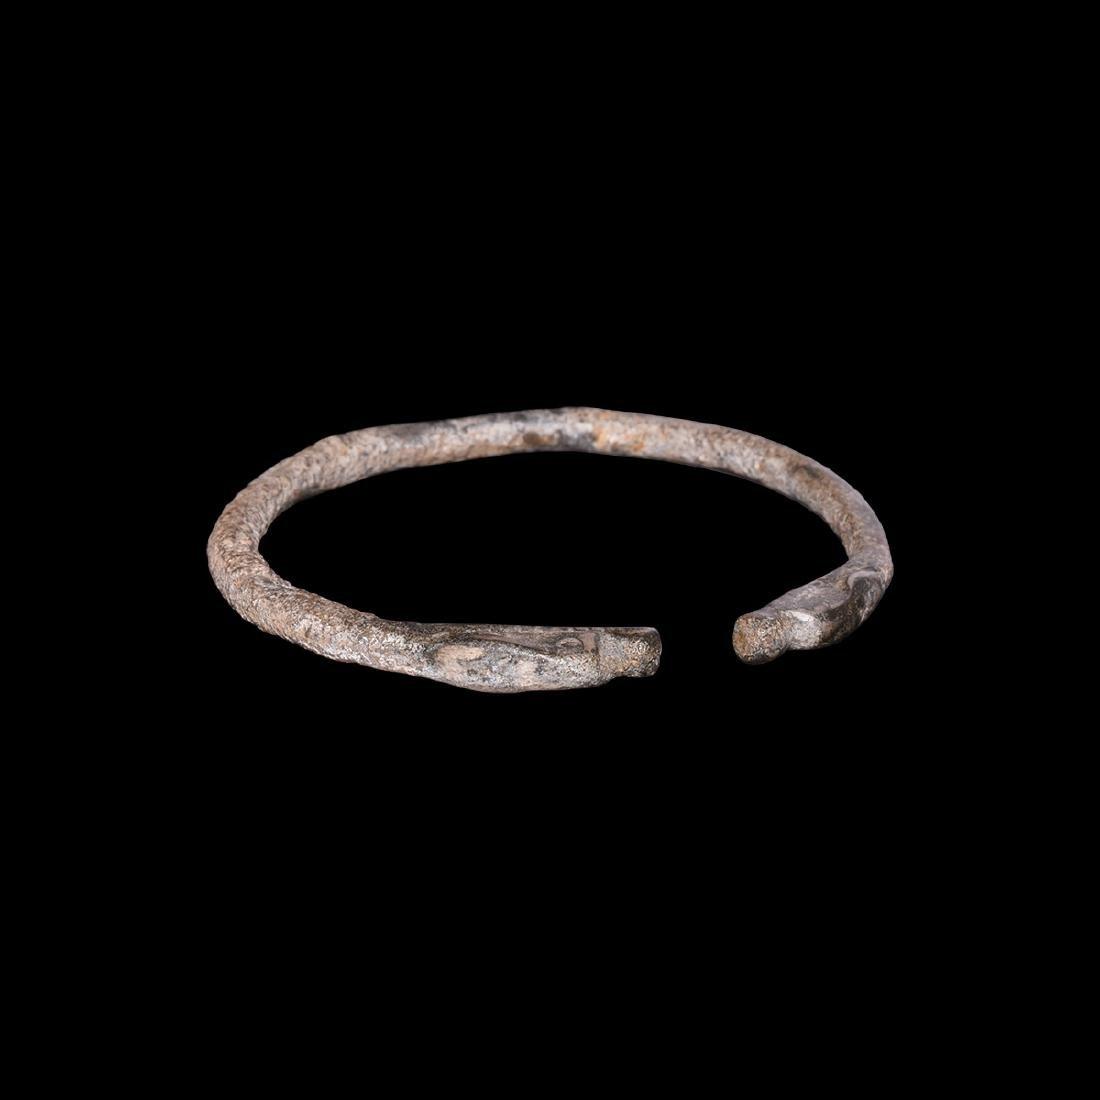 Western Asiatic Silver Bracelet with Animal Head